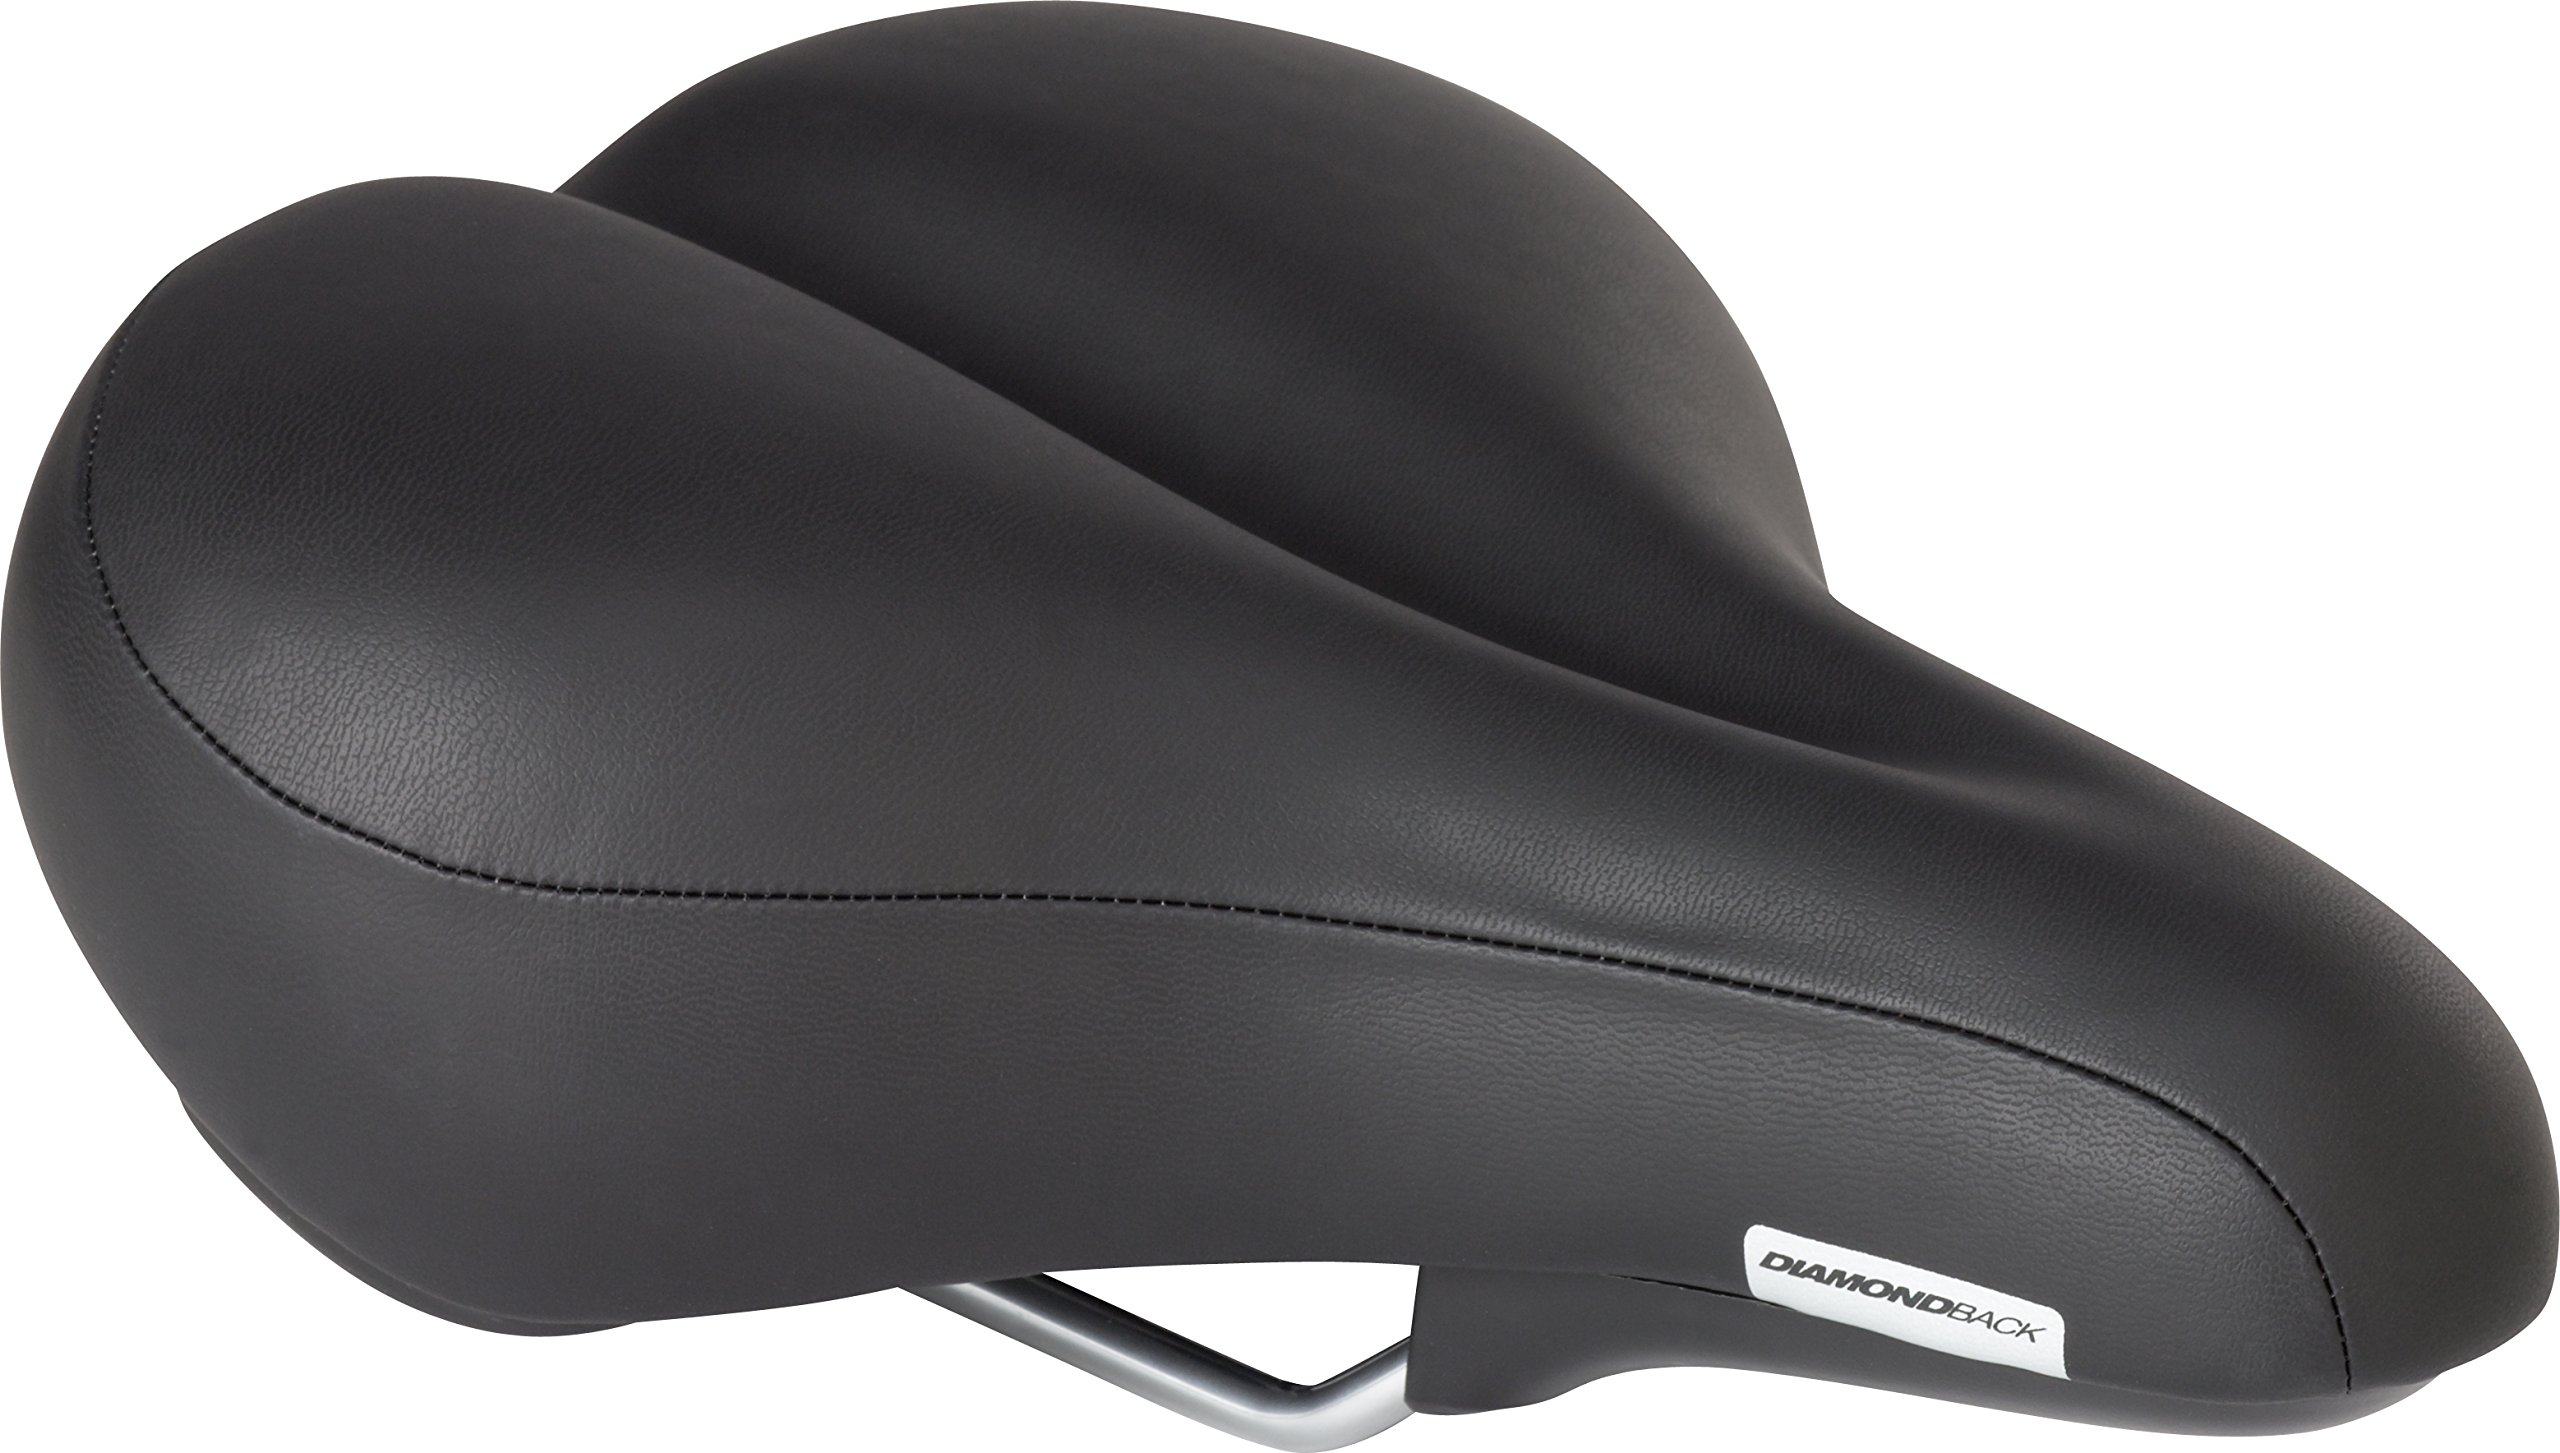 Diamondback Men's Pillow Top Bicycle Saddle, Black